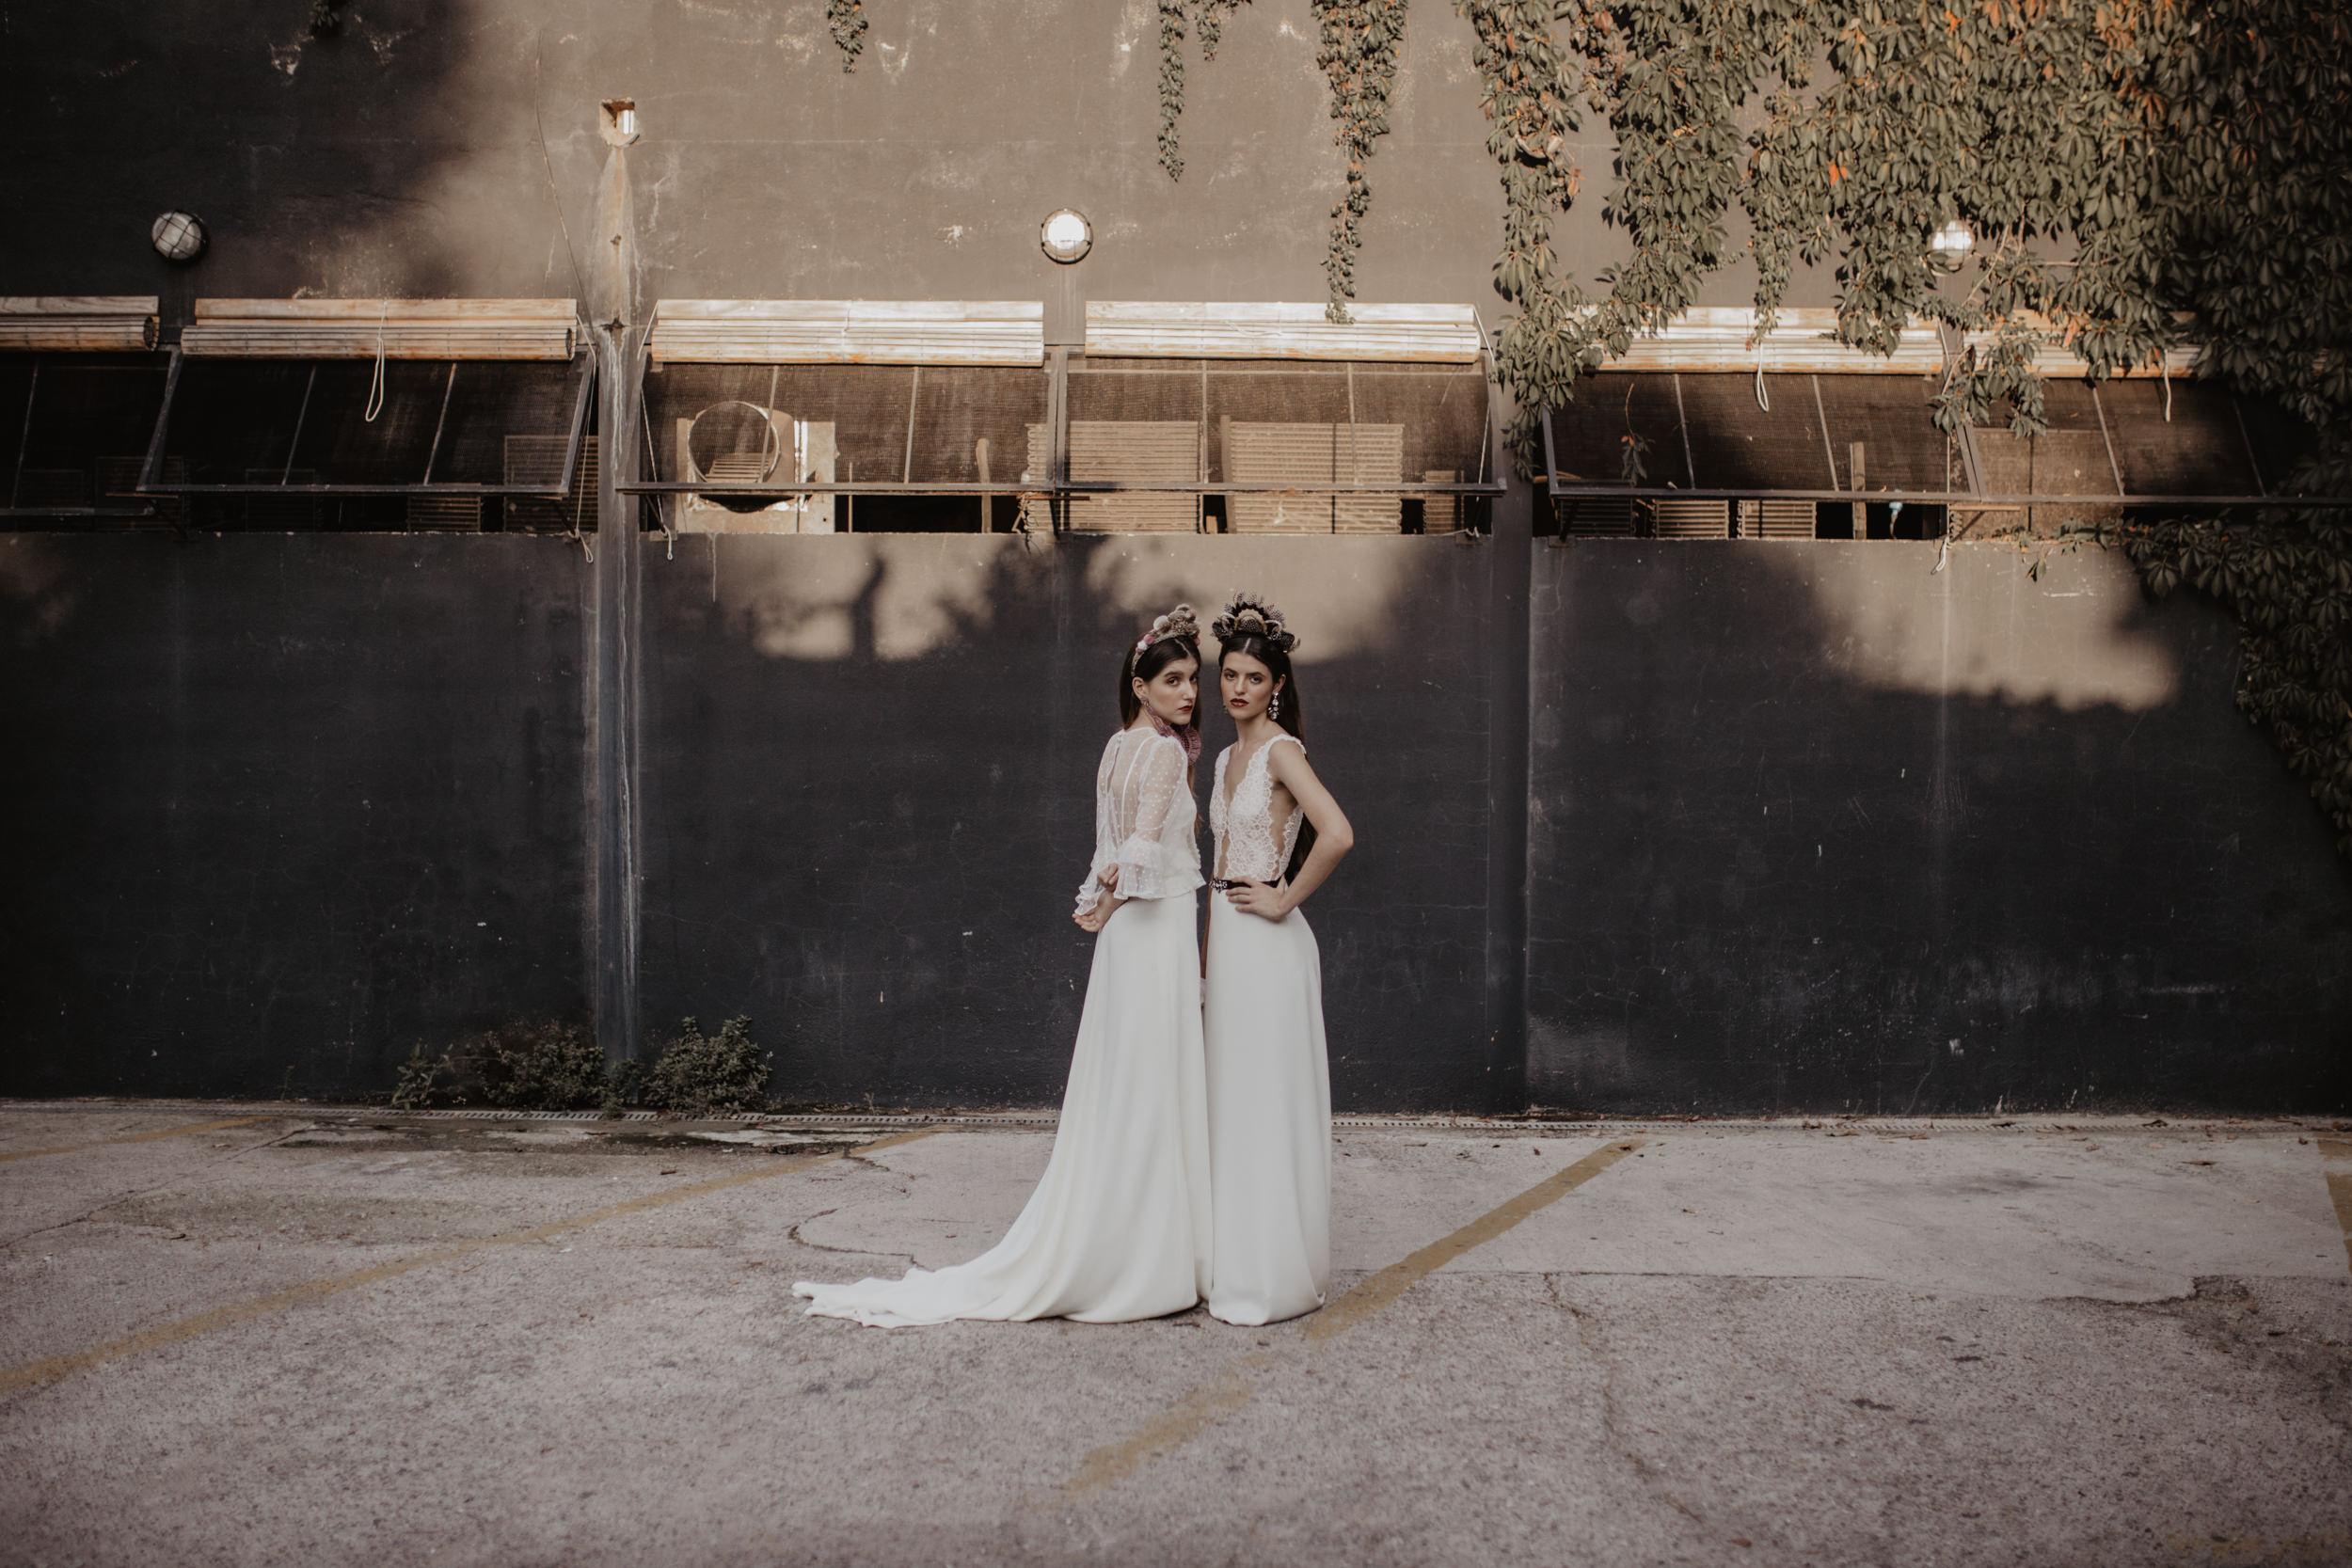 thenortherngirlphotography_photography_thenortherngirl_rebeccascabros_wedding_weddingphotography_weddingphotographer_barcelona_fashionbarcelona_unconventionalwedding_lacasademuñecas-225.jpg